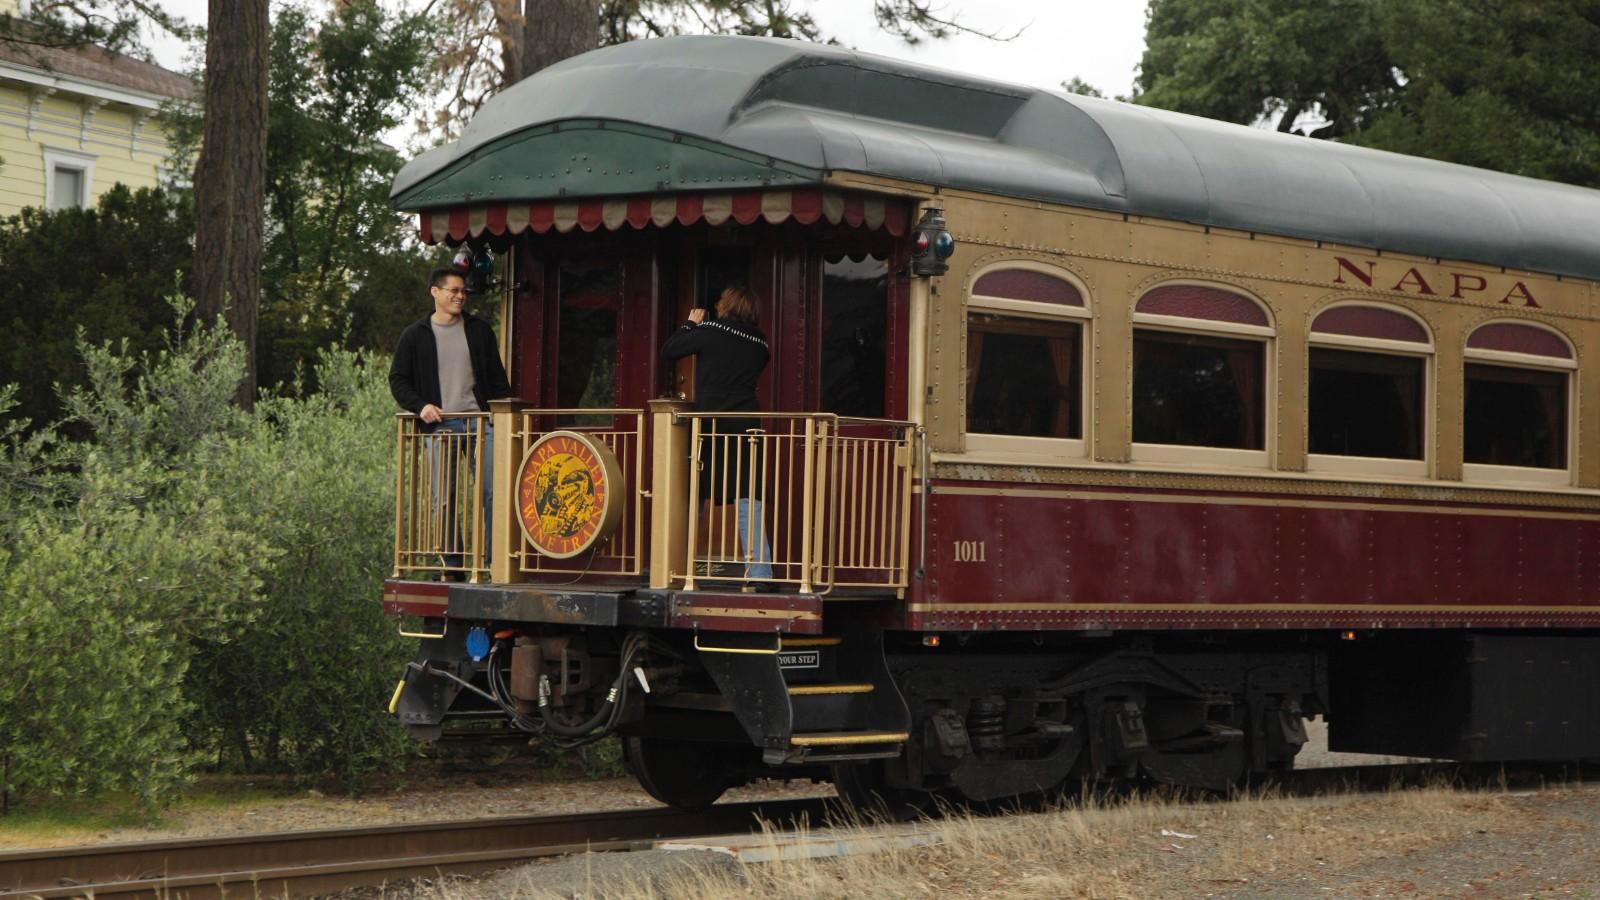 Napa Valley Wine Train CEO apologizes to book club - CNN